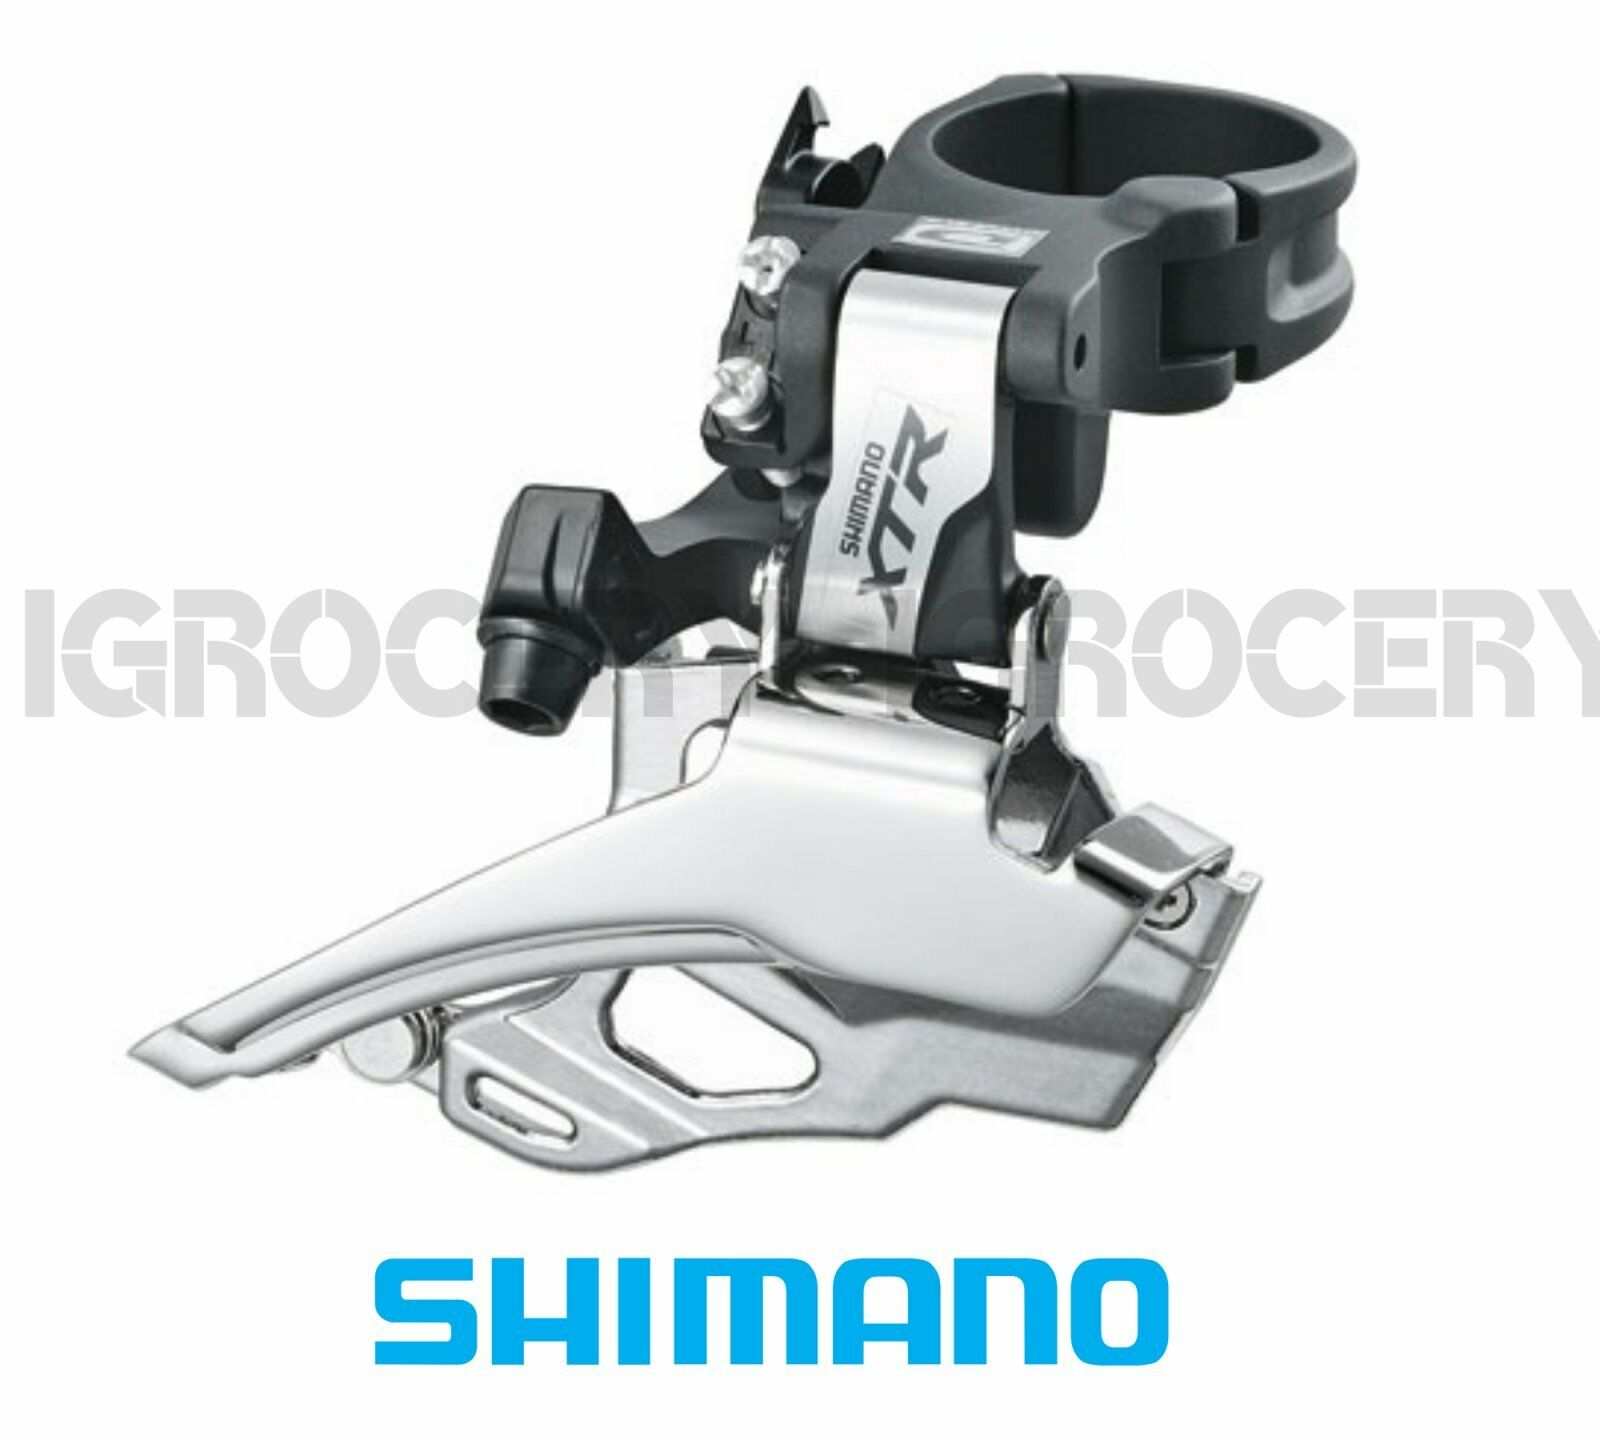 Shimano XTR FD-M986 Down-Swing Front Derailleur 2x10-speed